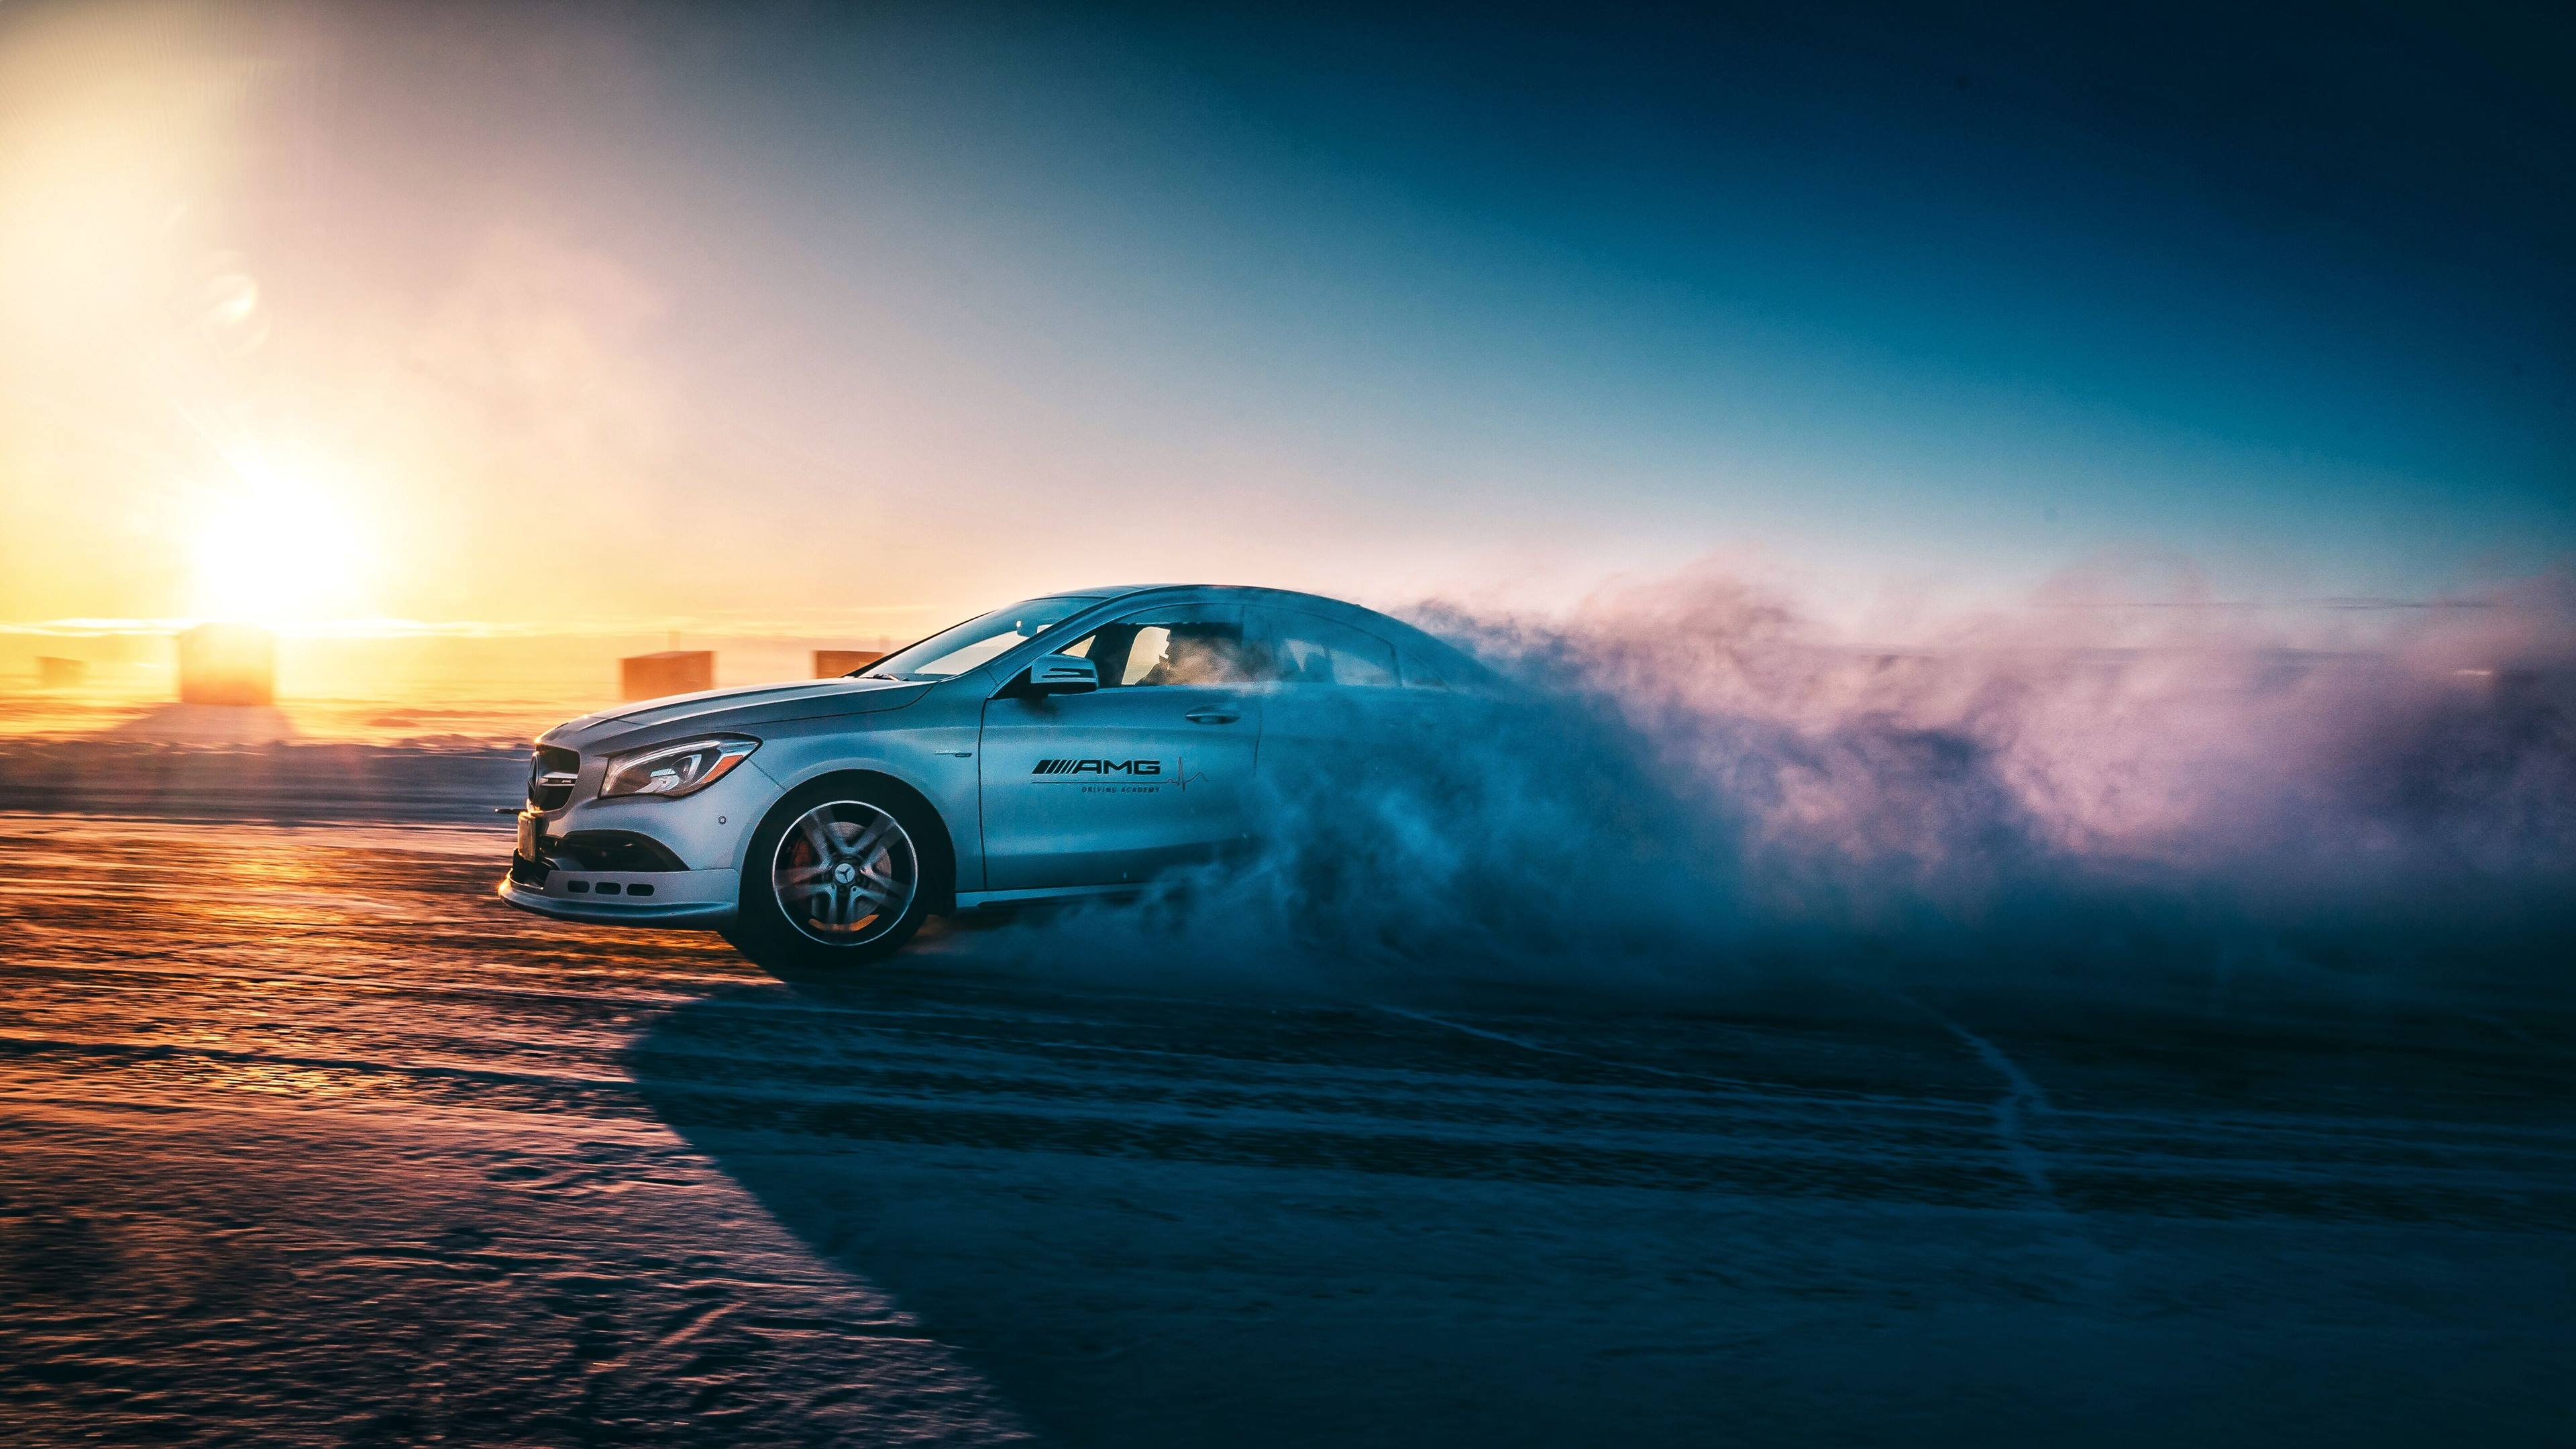 Mercedes-AMG snow drifting